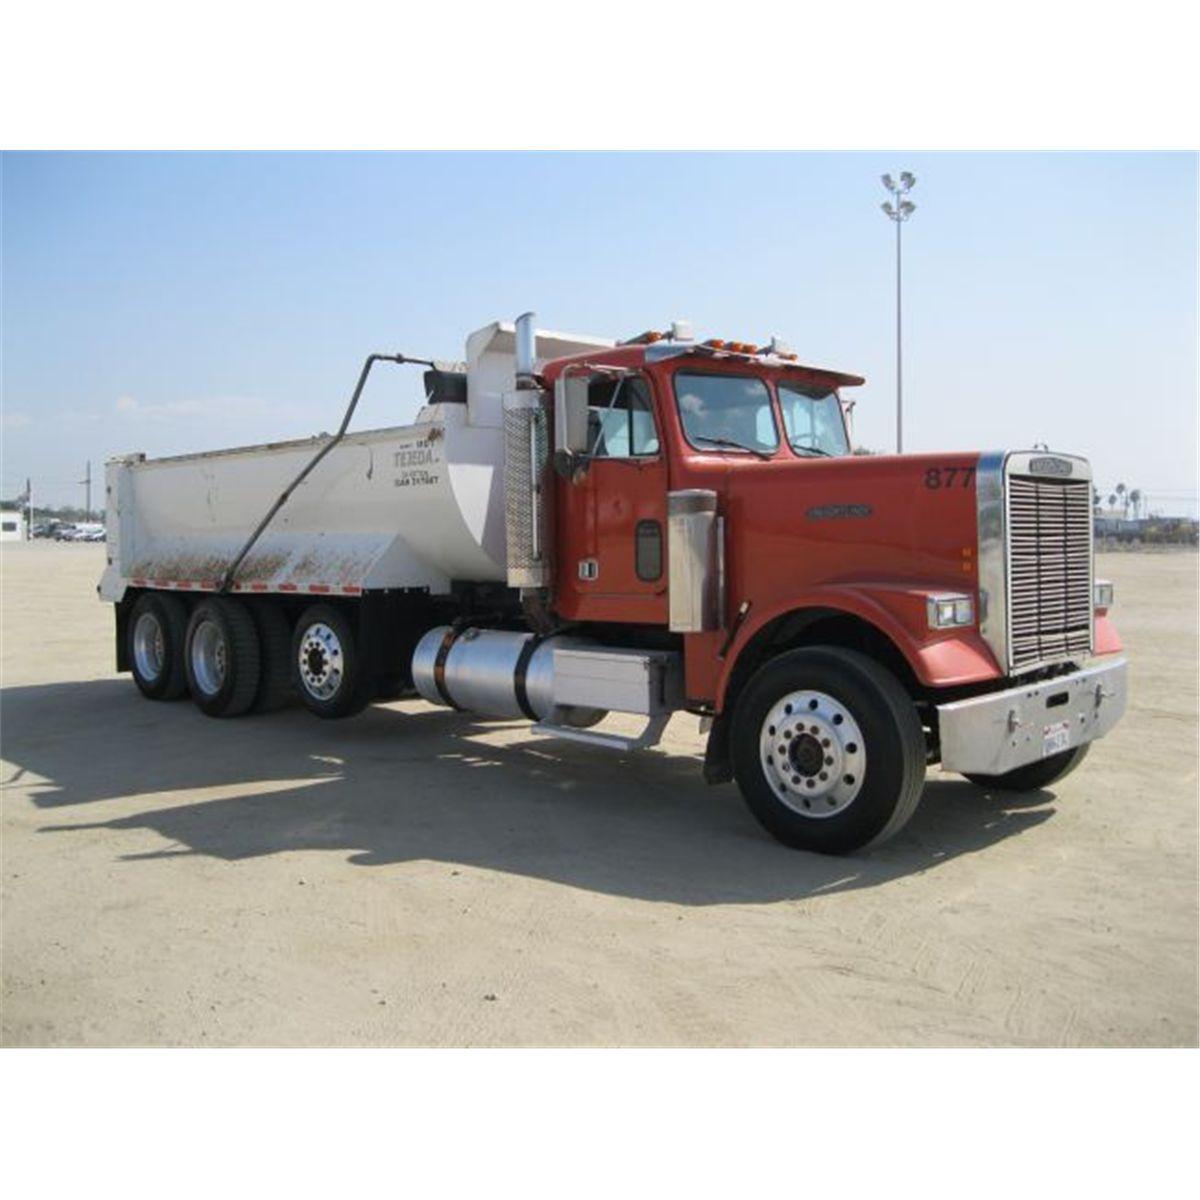 1989 Freightliner Super 10 Dump Truck